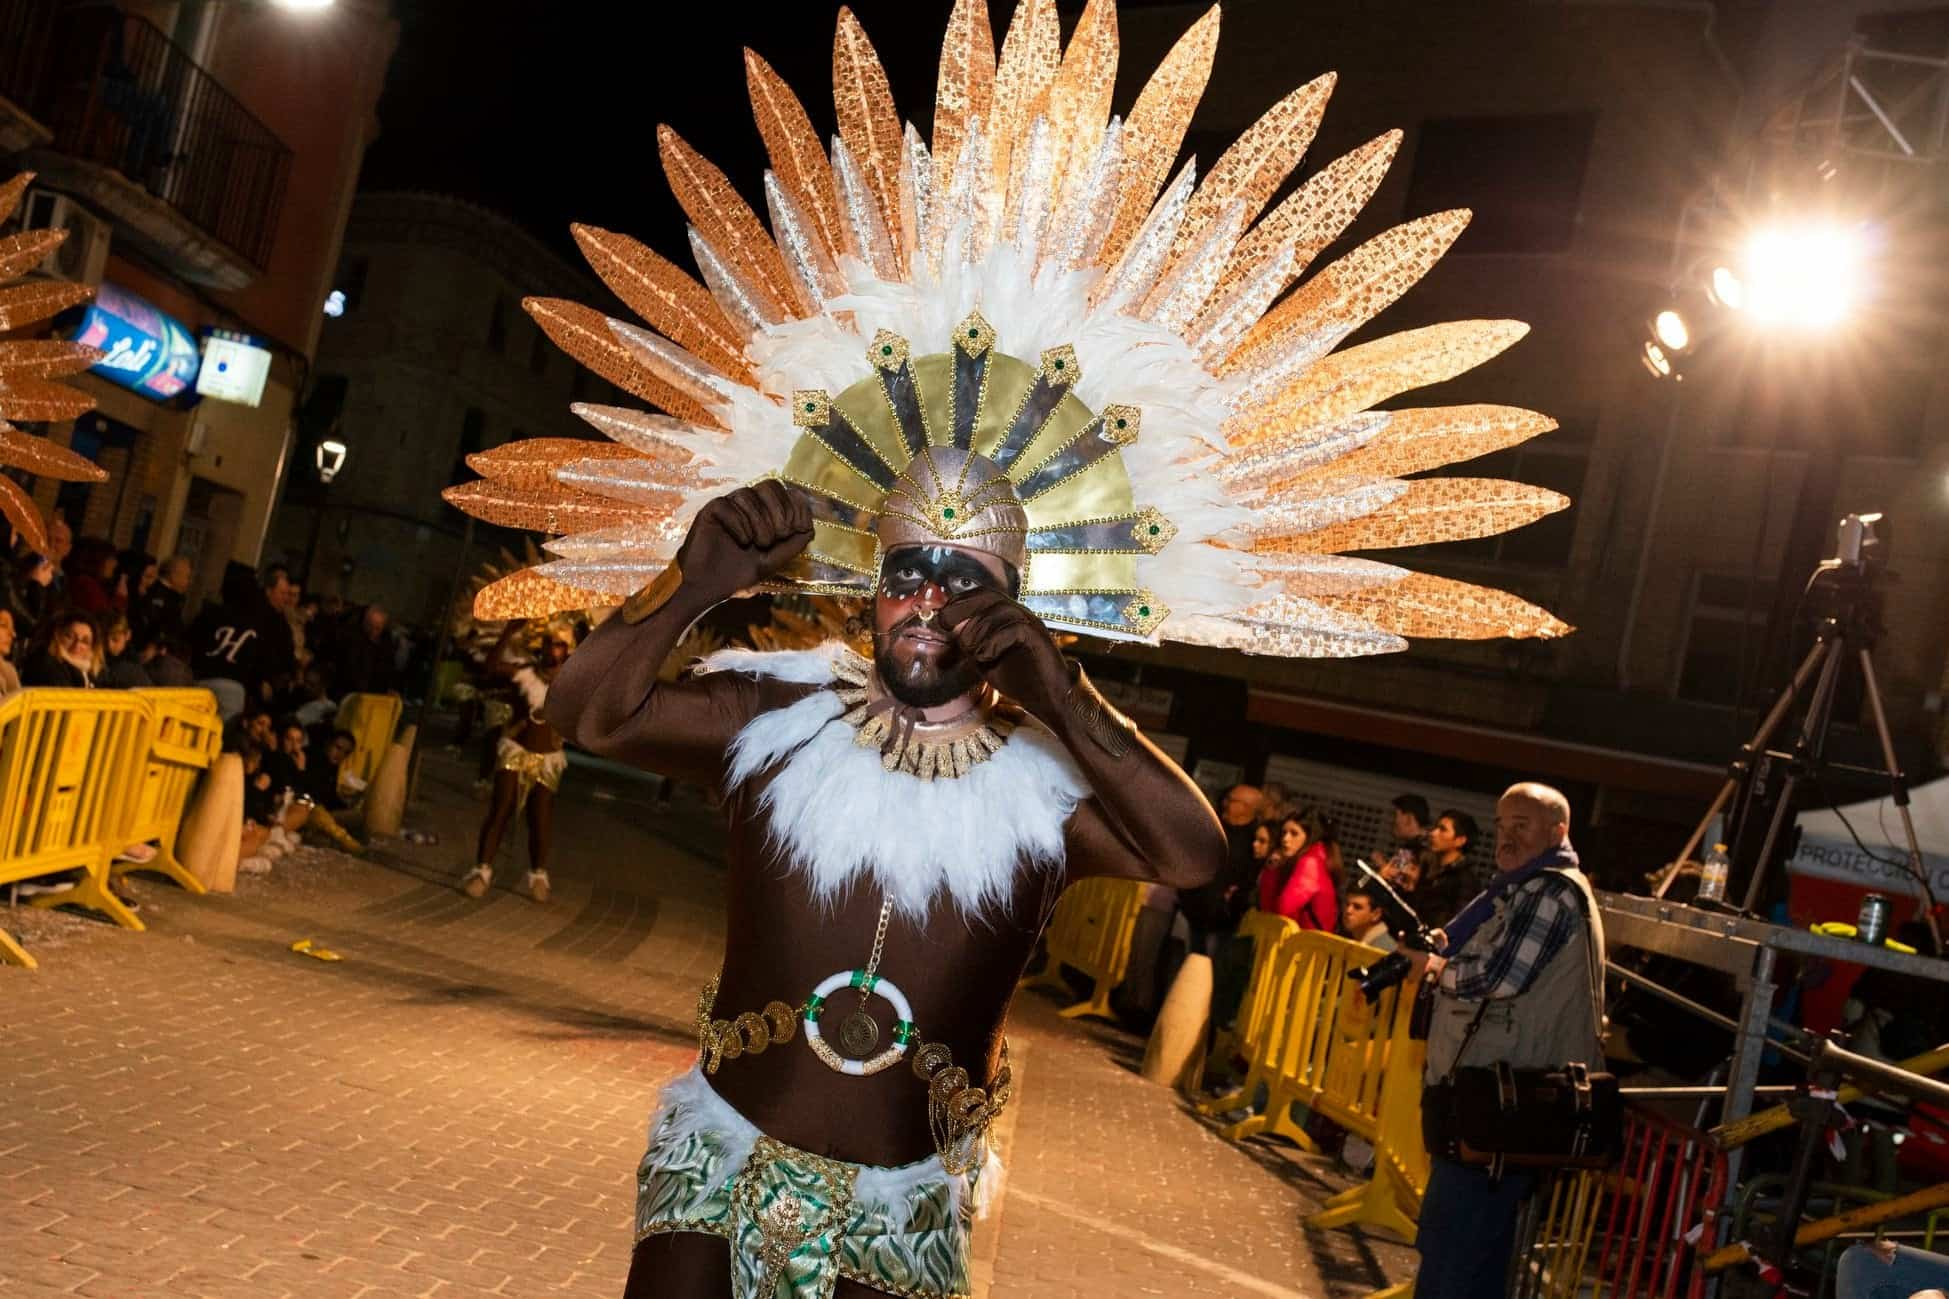 Carnaval de herencia 2020 ofertorio 158 - Selección de fotografías del Ofertorio del Carnaval de Herencia